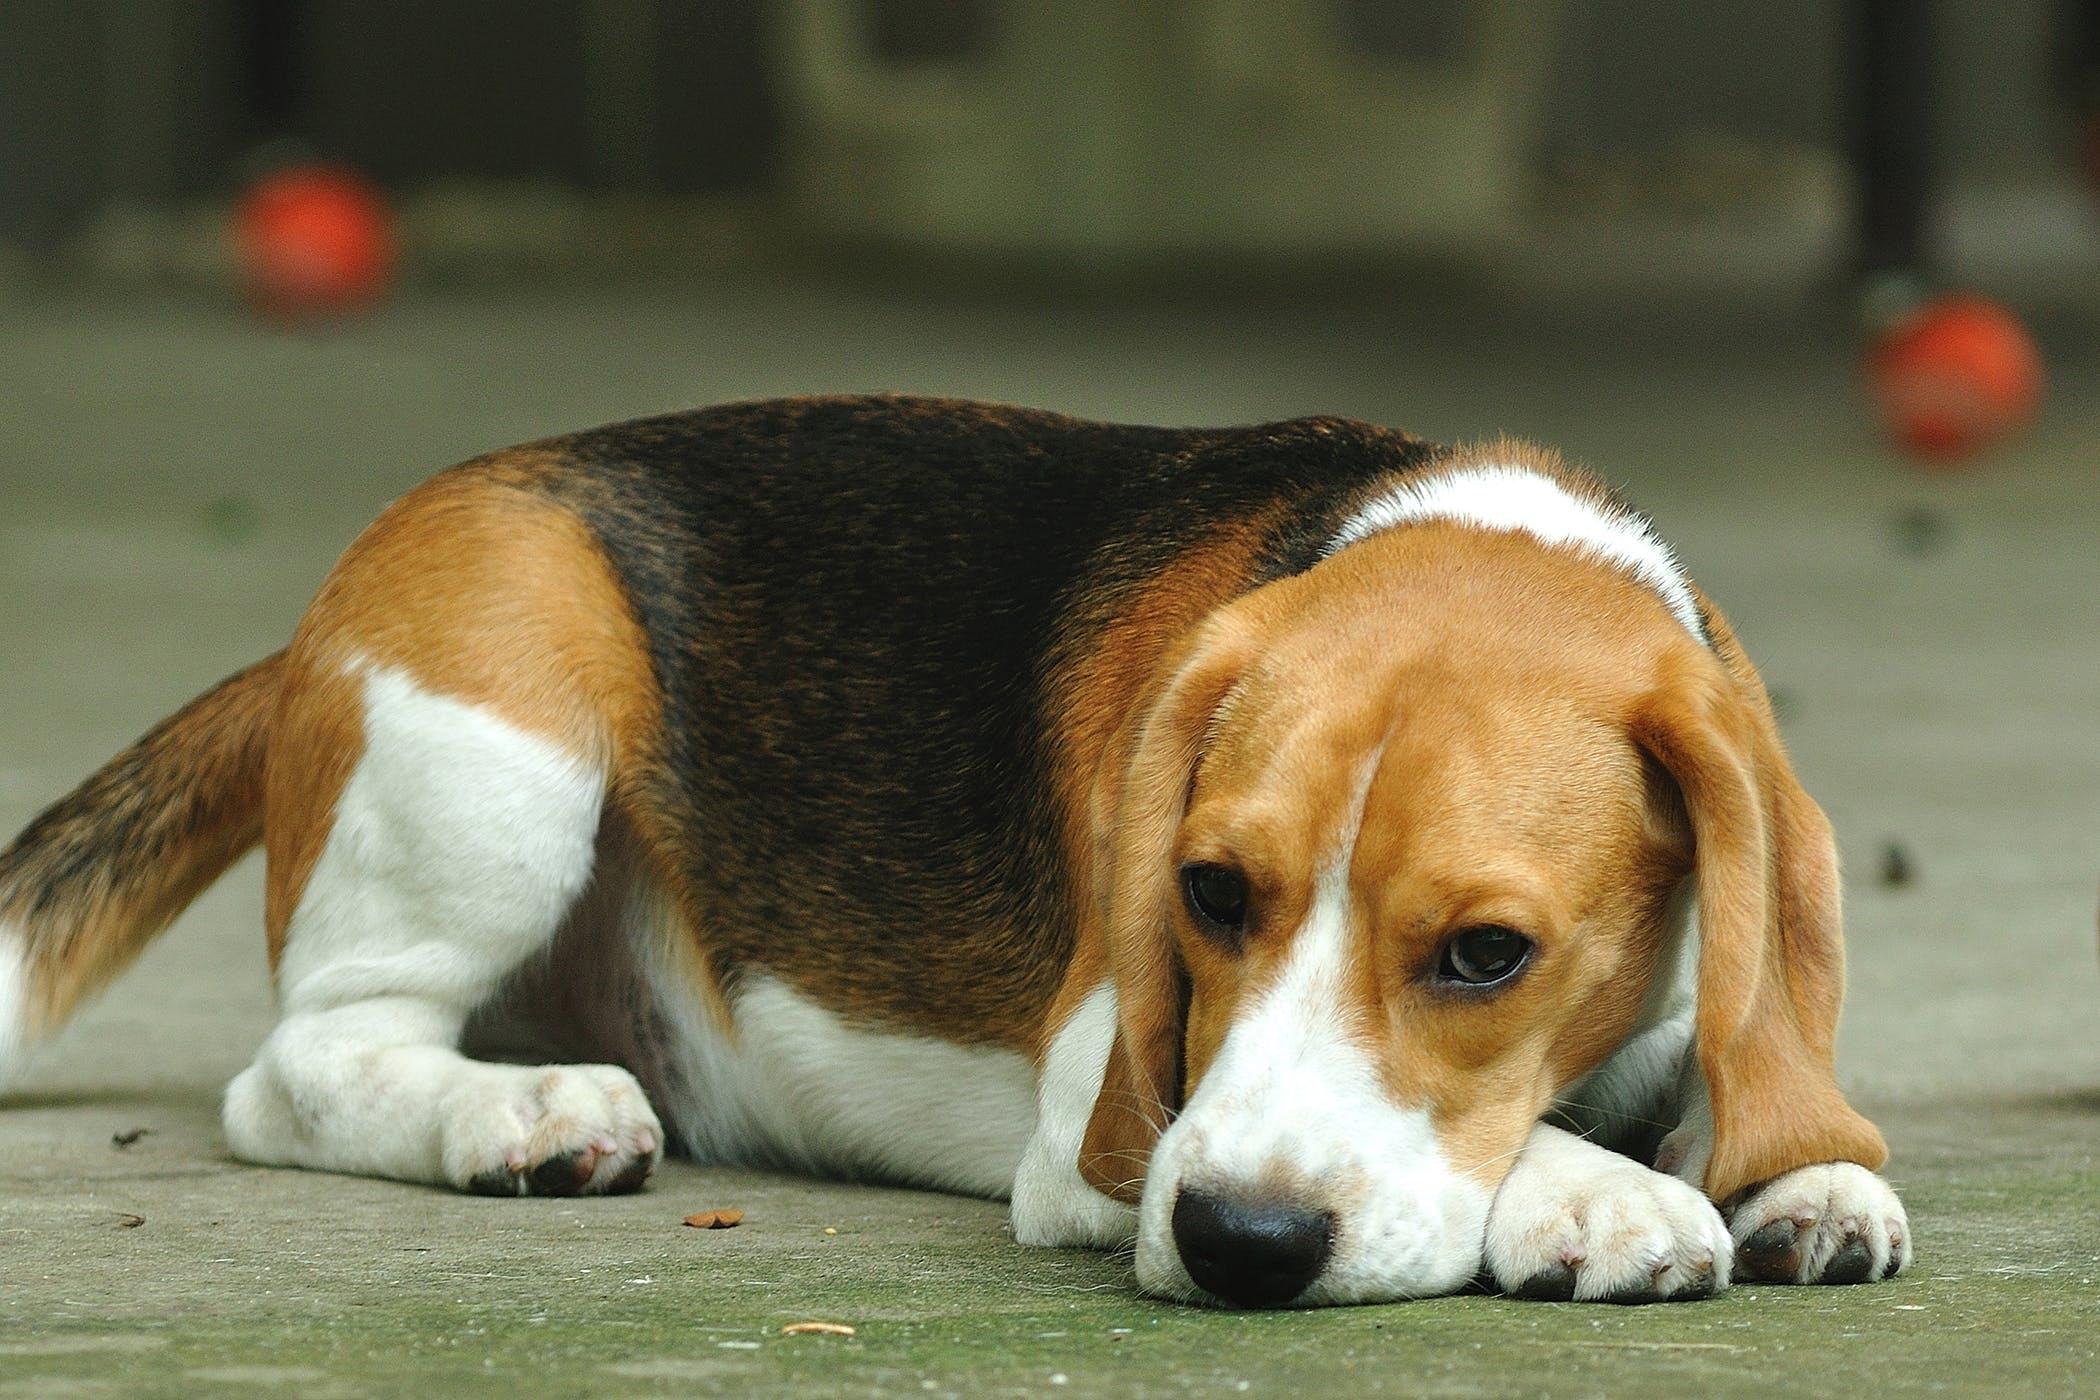 Inguinal Herniorrhaphy in Dogs